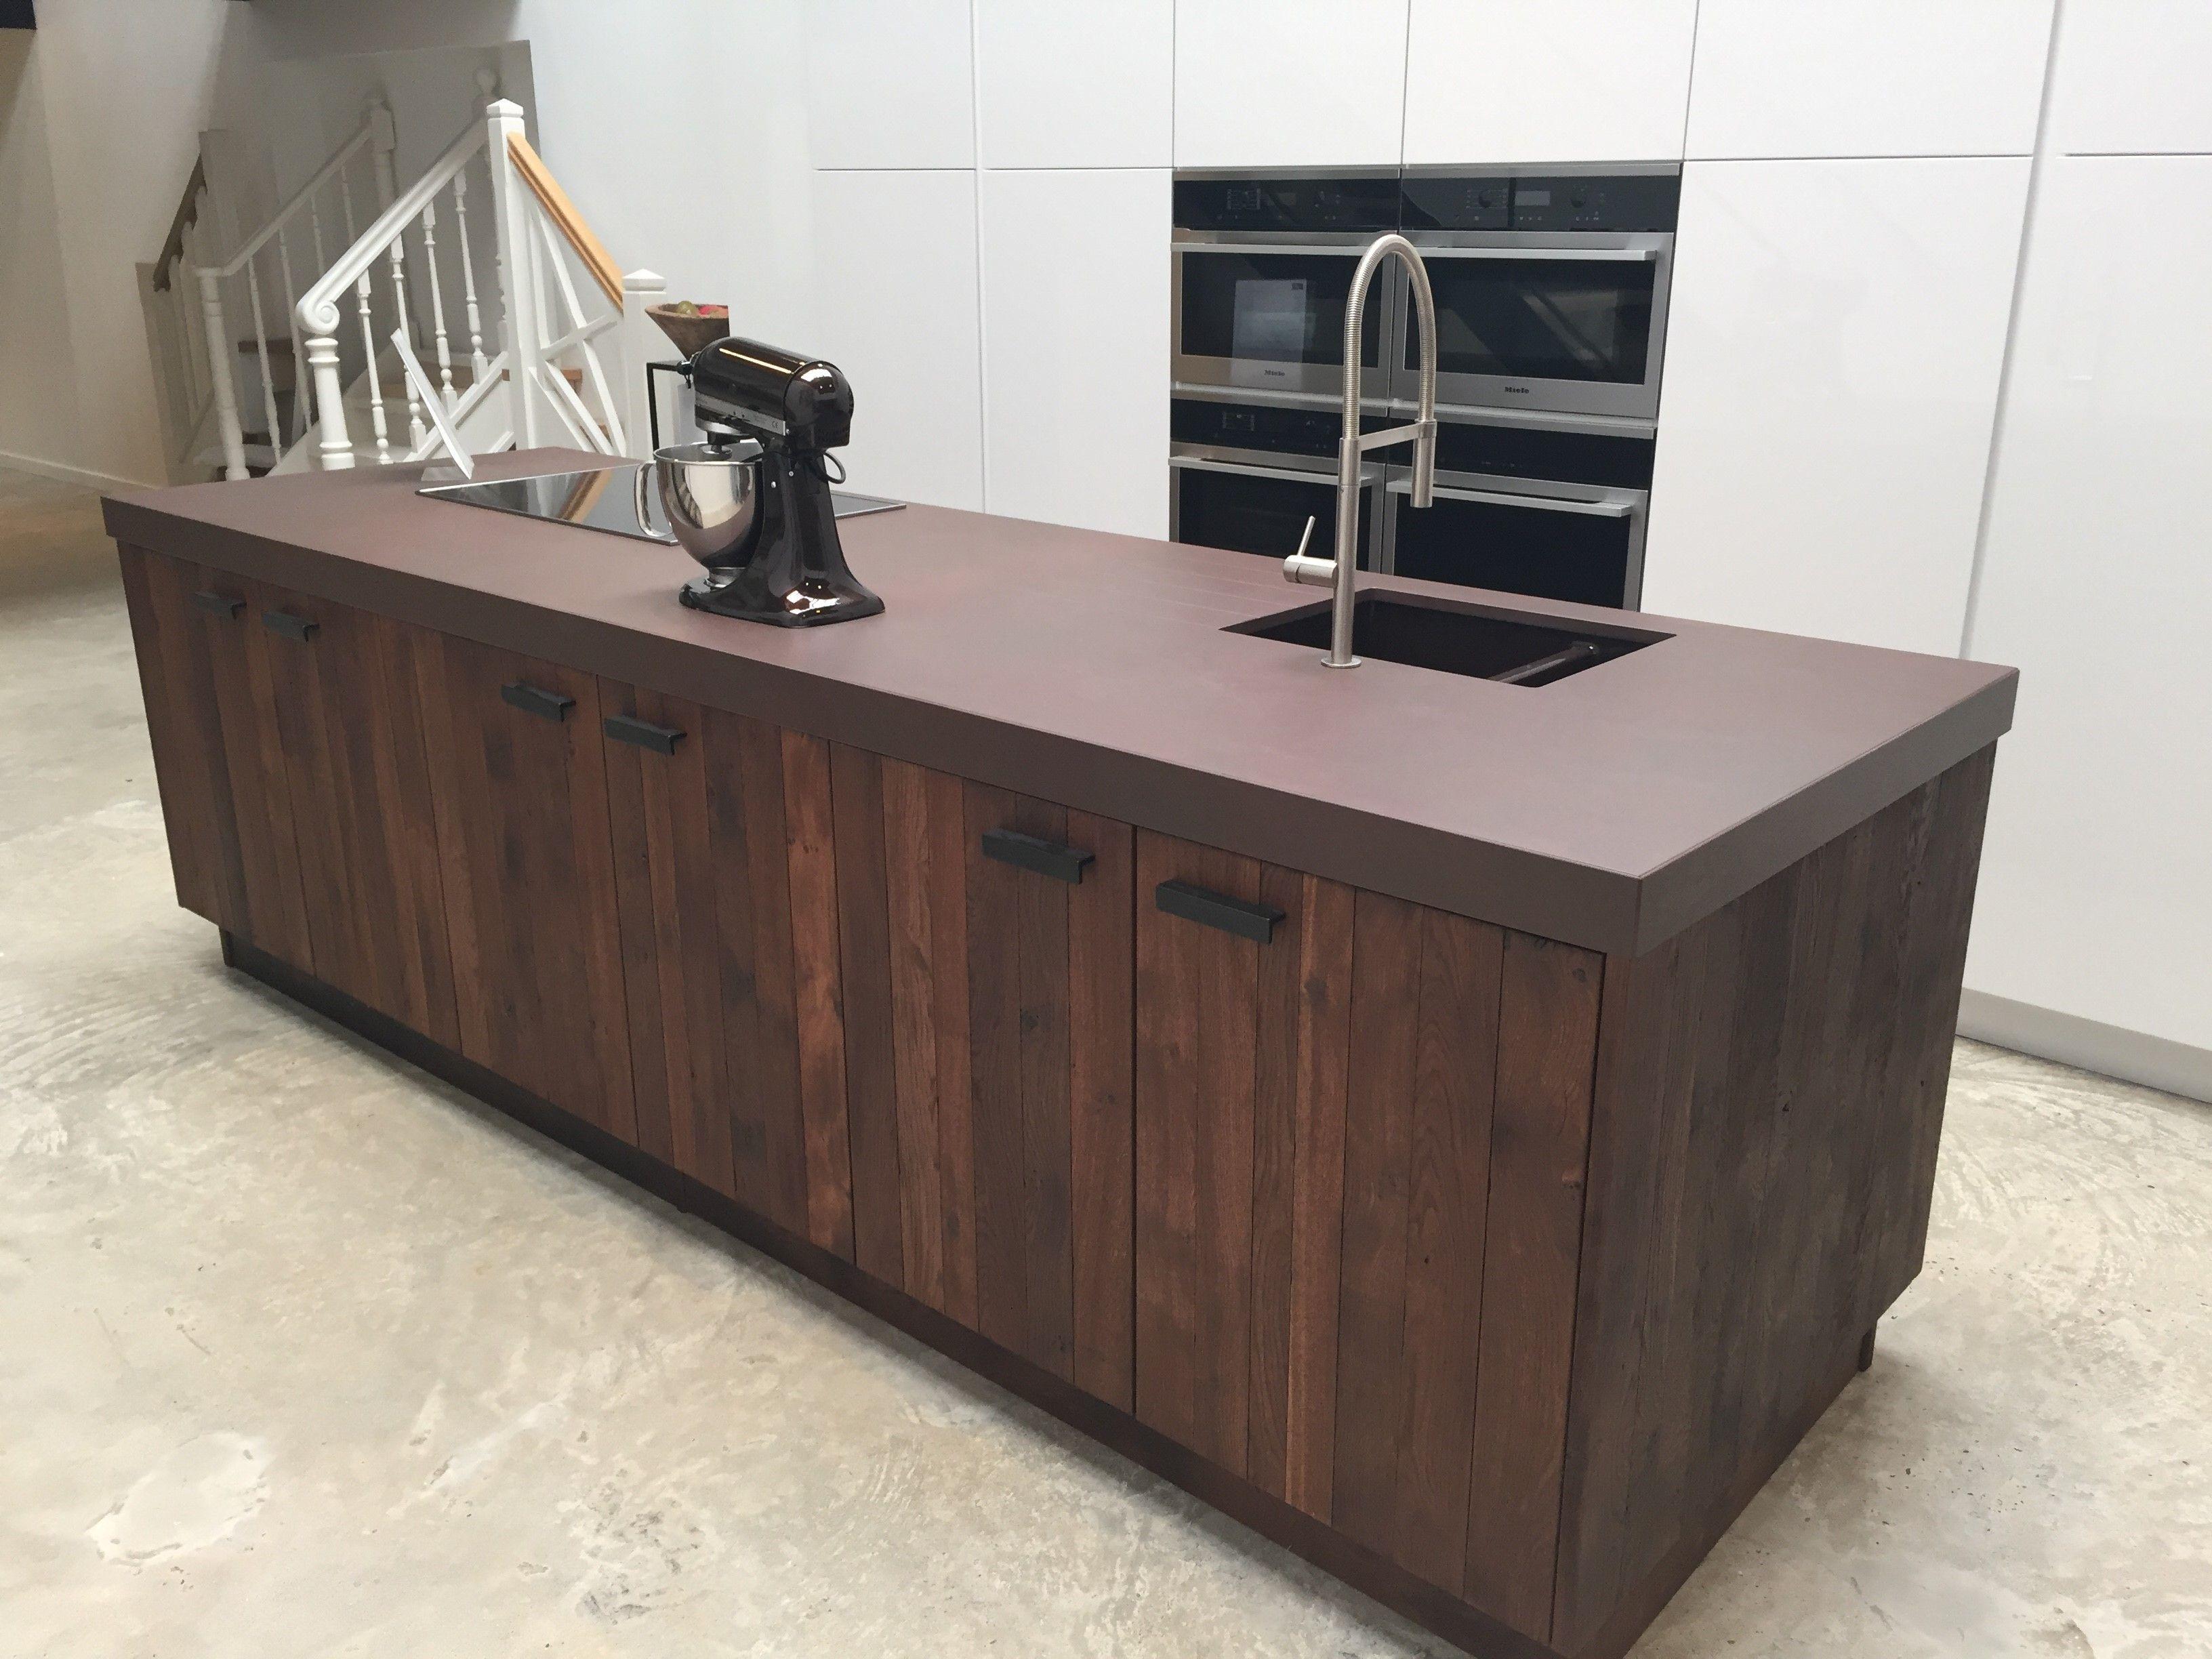 dekton kadum island kitchentop by freja home styling dekton